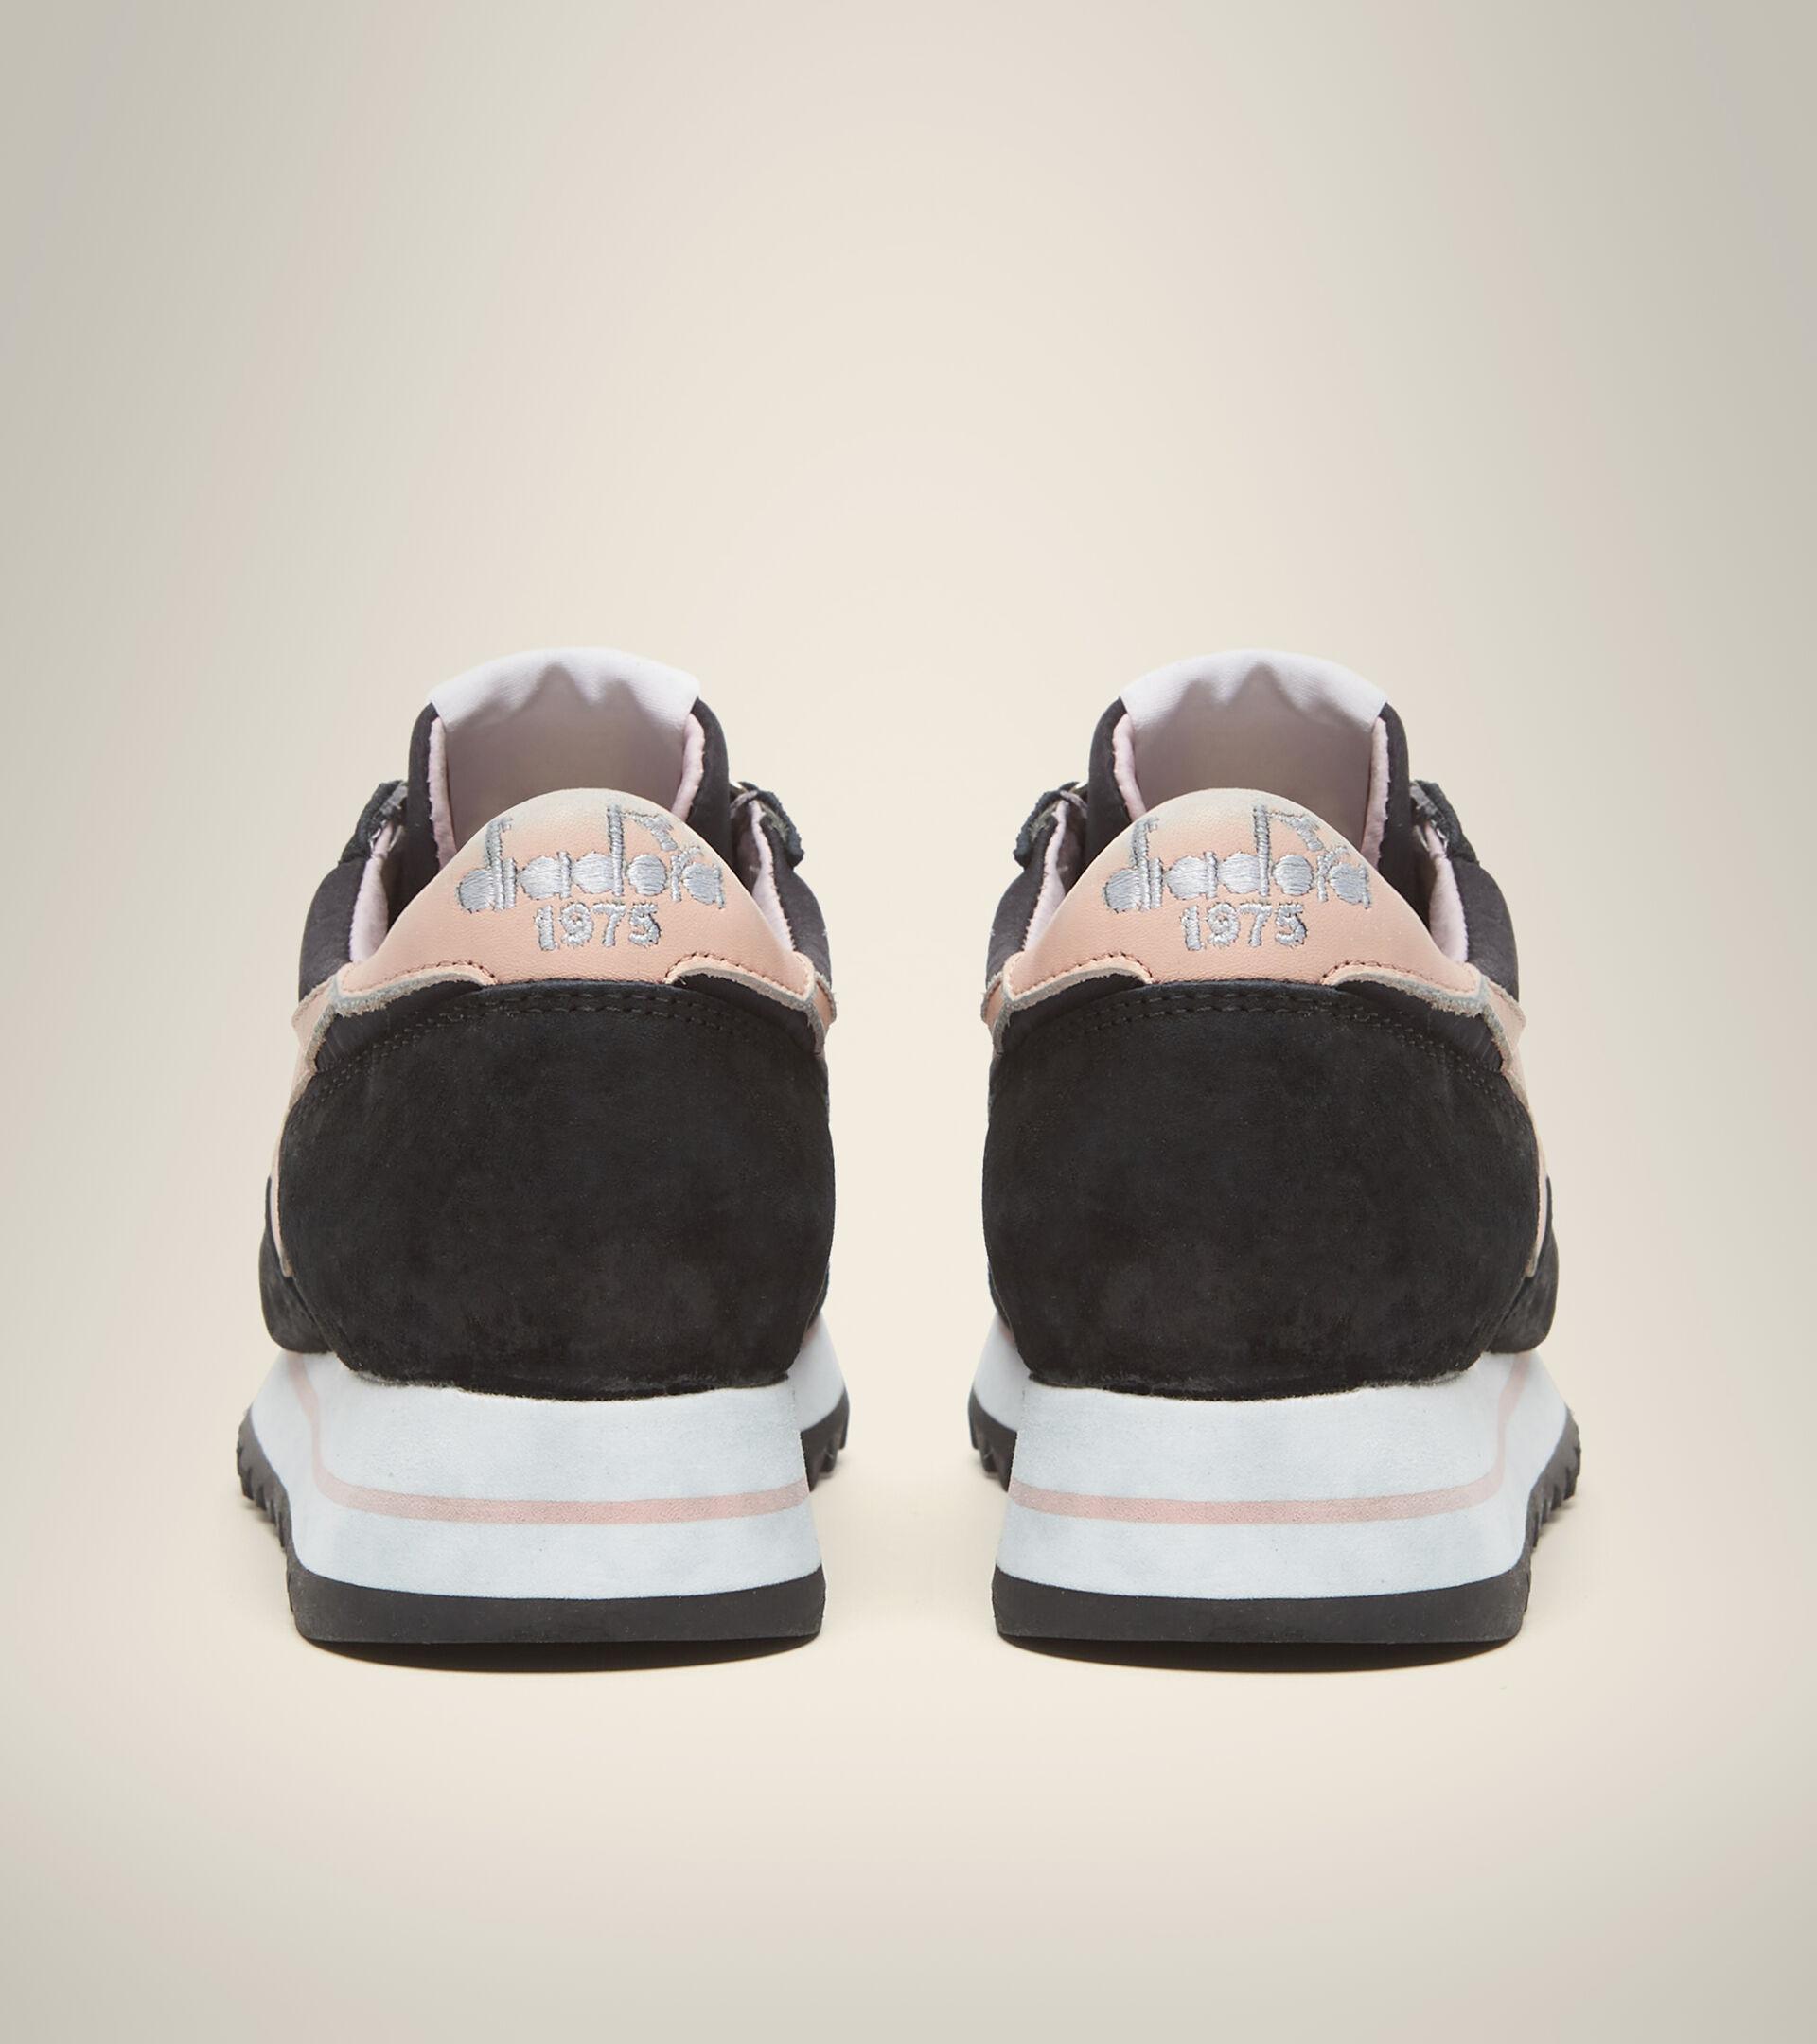 Heritage-Schuh - Damen EQUIPE SUEDE SW EVO WN DUNKEL MARINEBLAU - Diadora